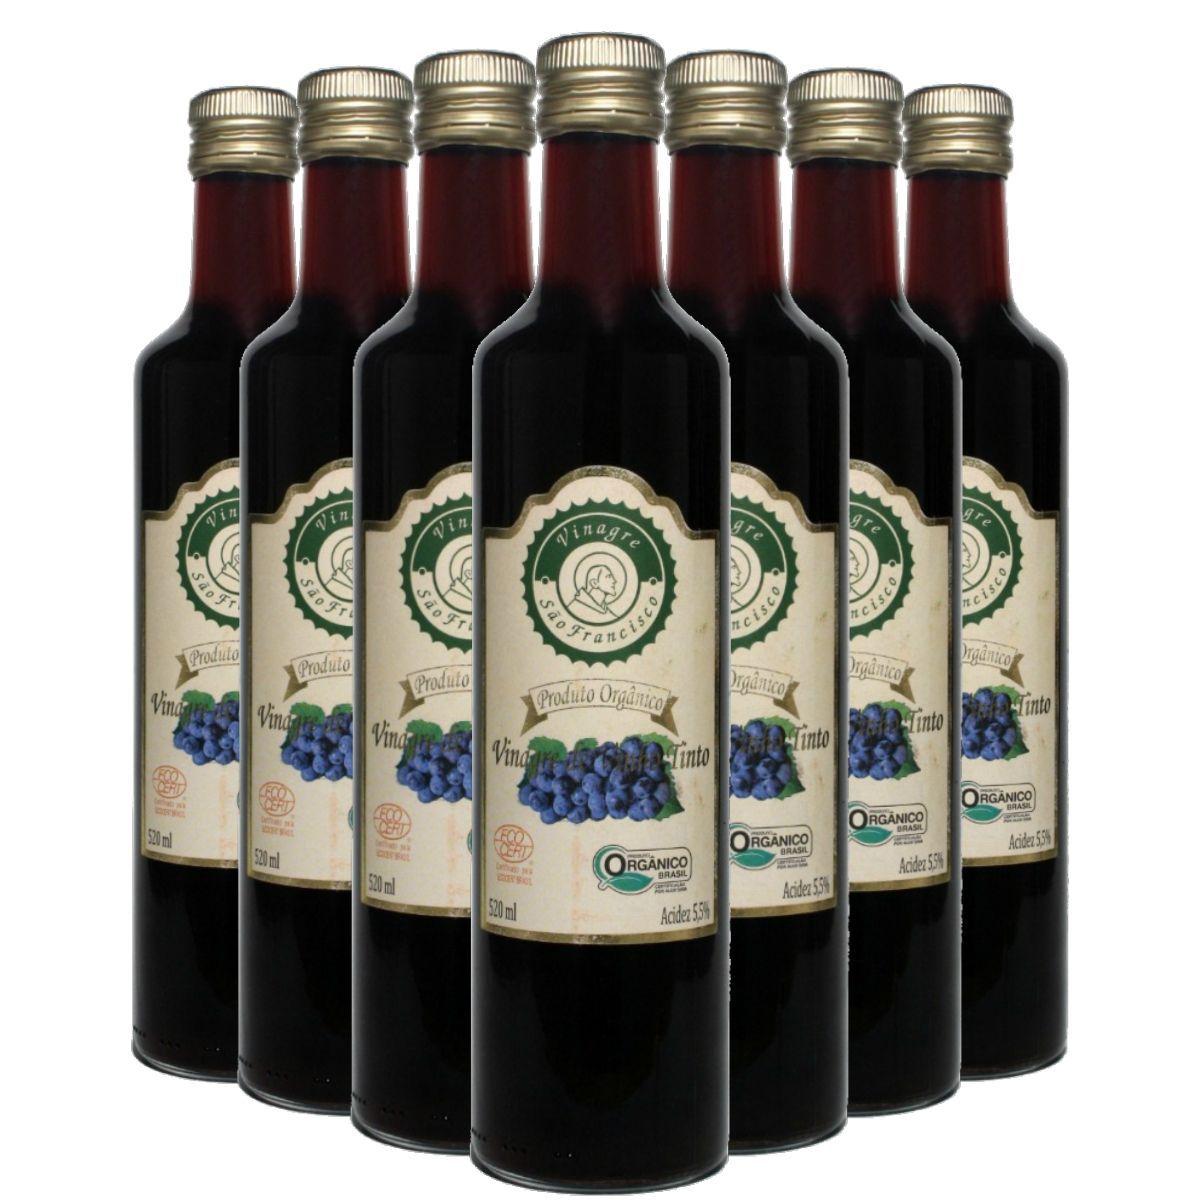 Kit 7 Vinagre Orgânico São Francisco Vinho Tinto Acidez 5,5% - 500ml